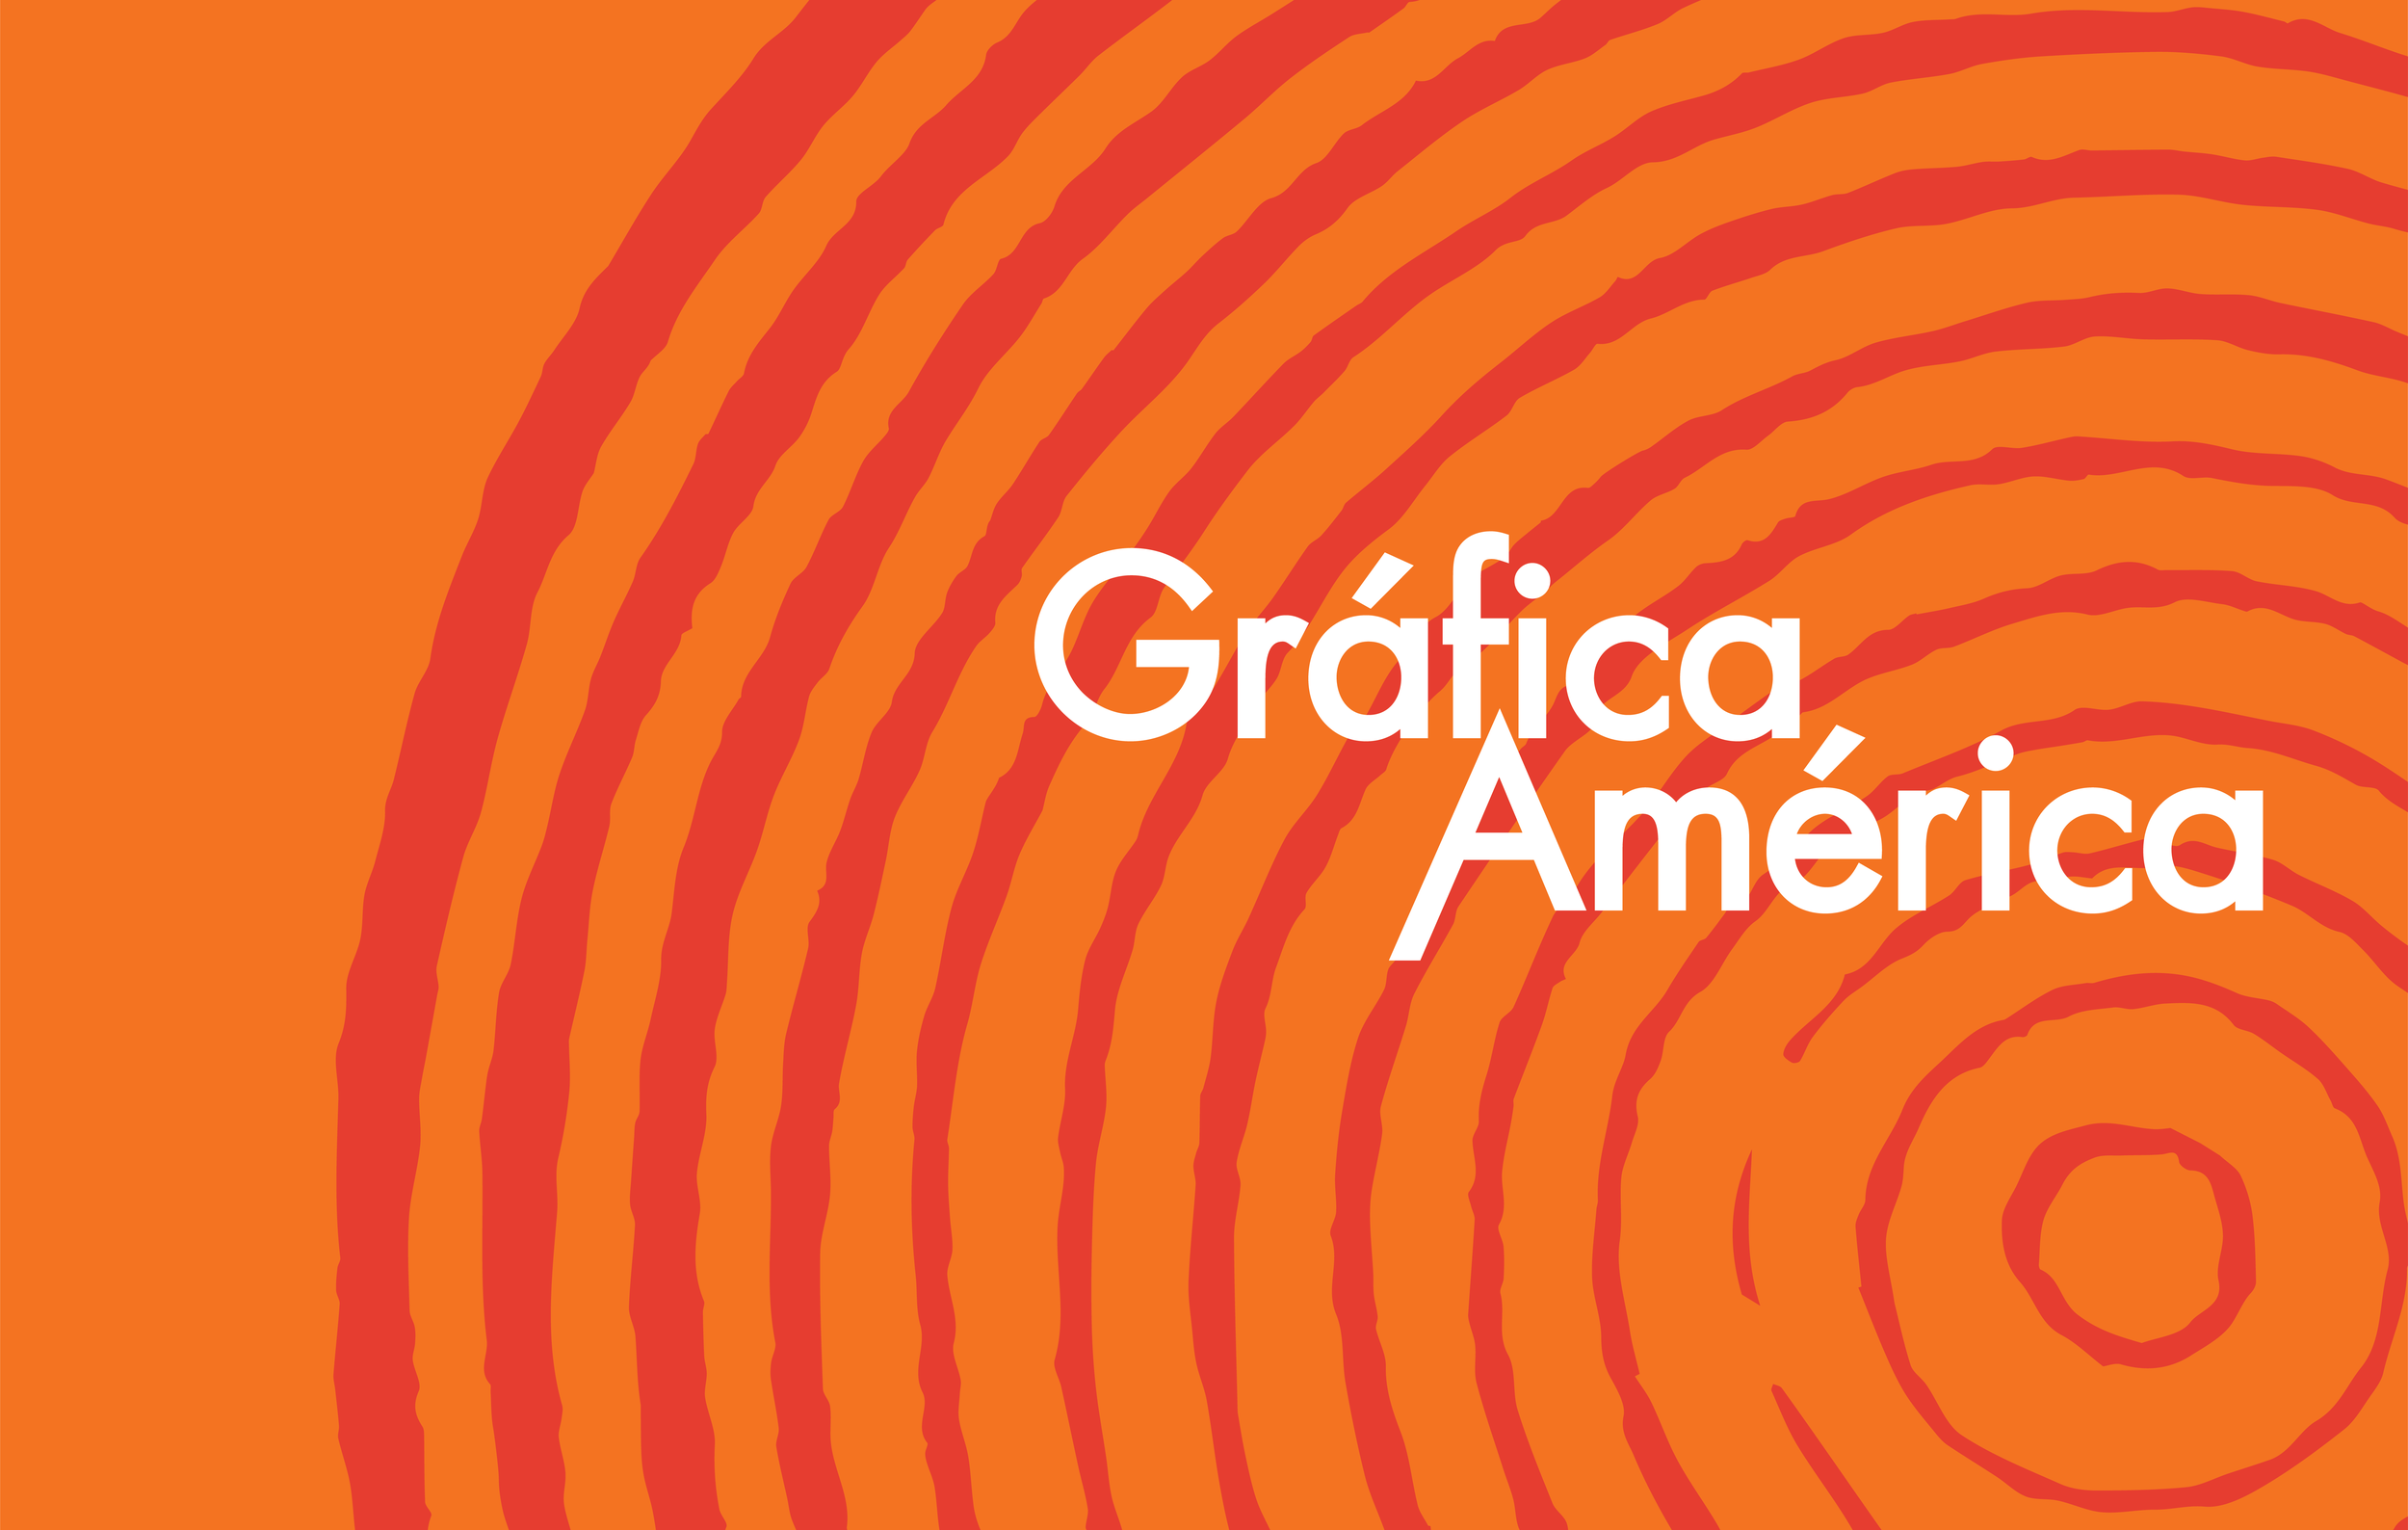 Grafica America Social Media_001 MOLLA WEBSITE (1).png